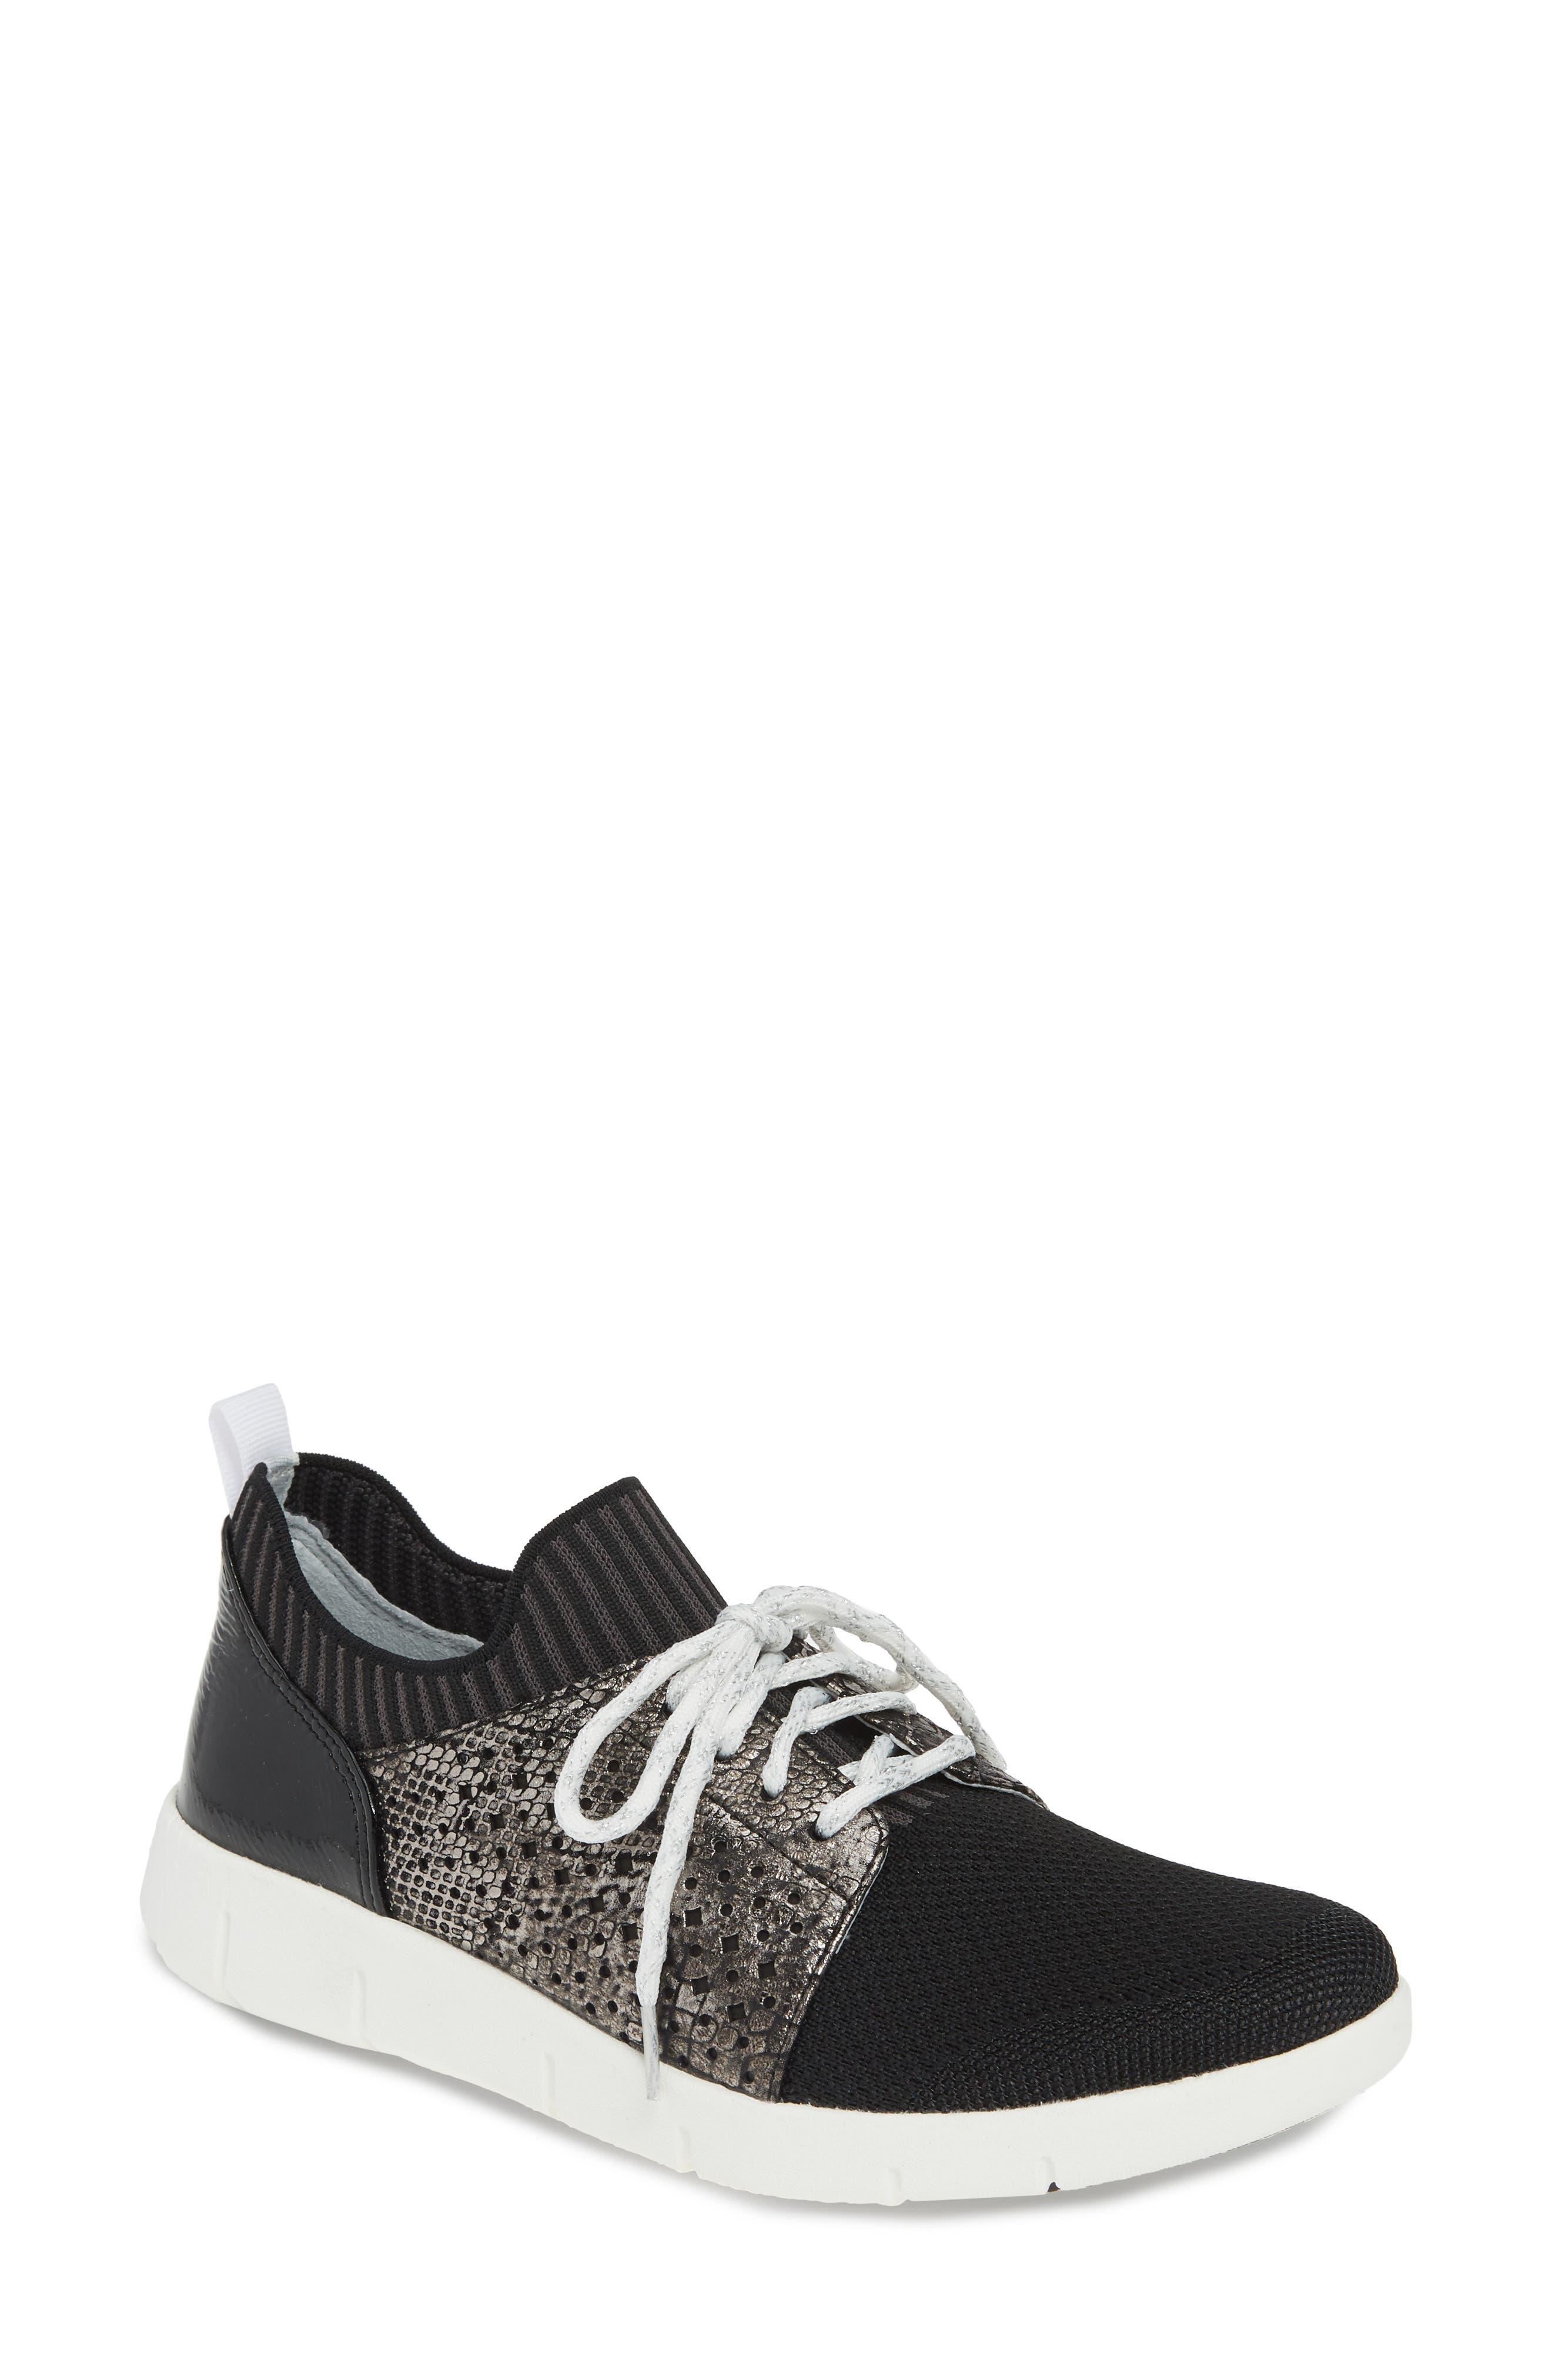 Johnston & Murphy Tamara Sneaker- Black